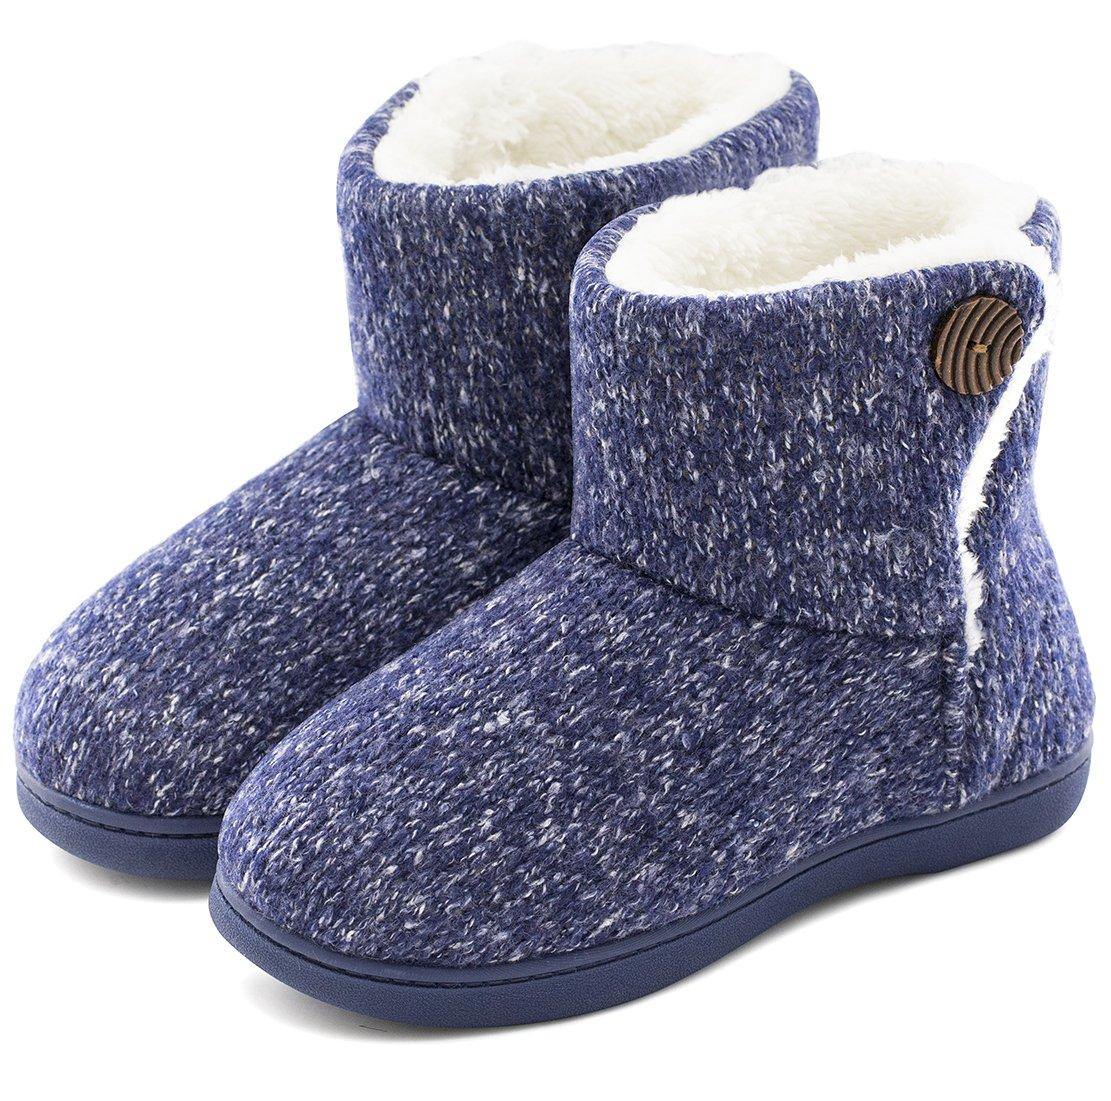 Women's Comfort Woolen Yarn Woven Bootie Slippers Memory Foam Plush Lining Slip-on House Shoes w/ Anti-Slip Sole Indoor, Outdoor, Navy Blue, Medium / 7-8 B(M) US